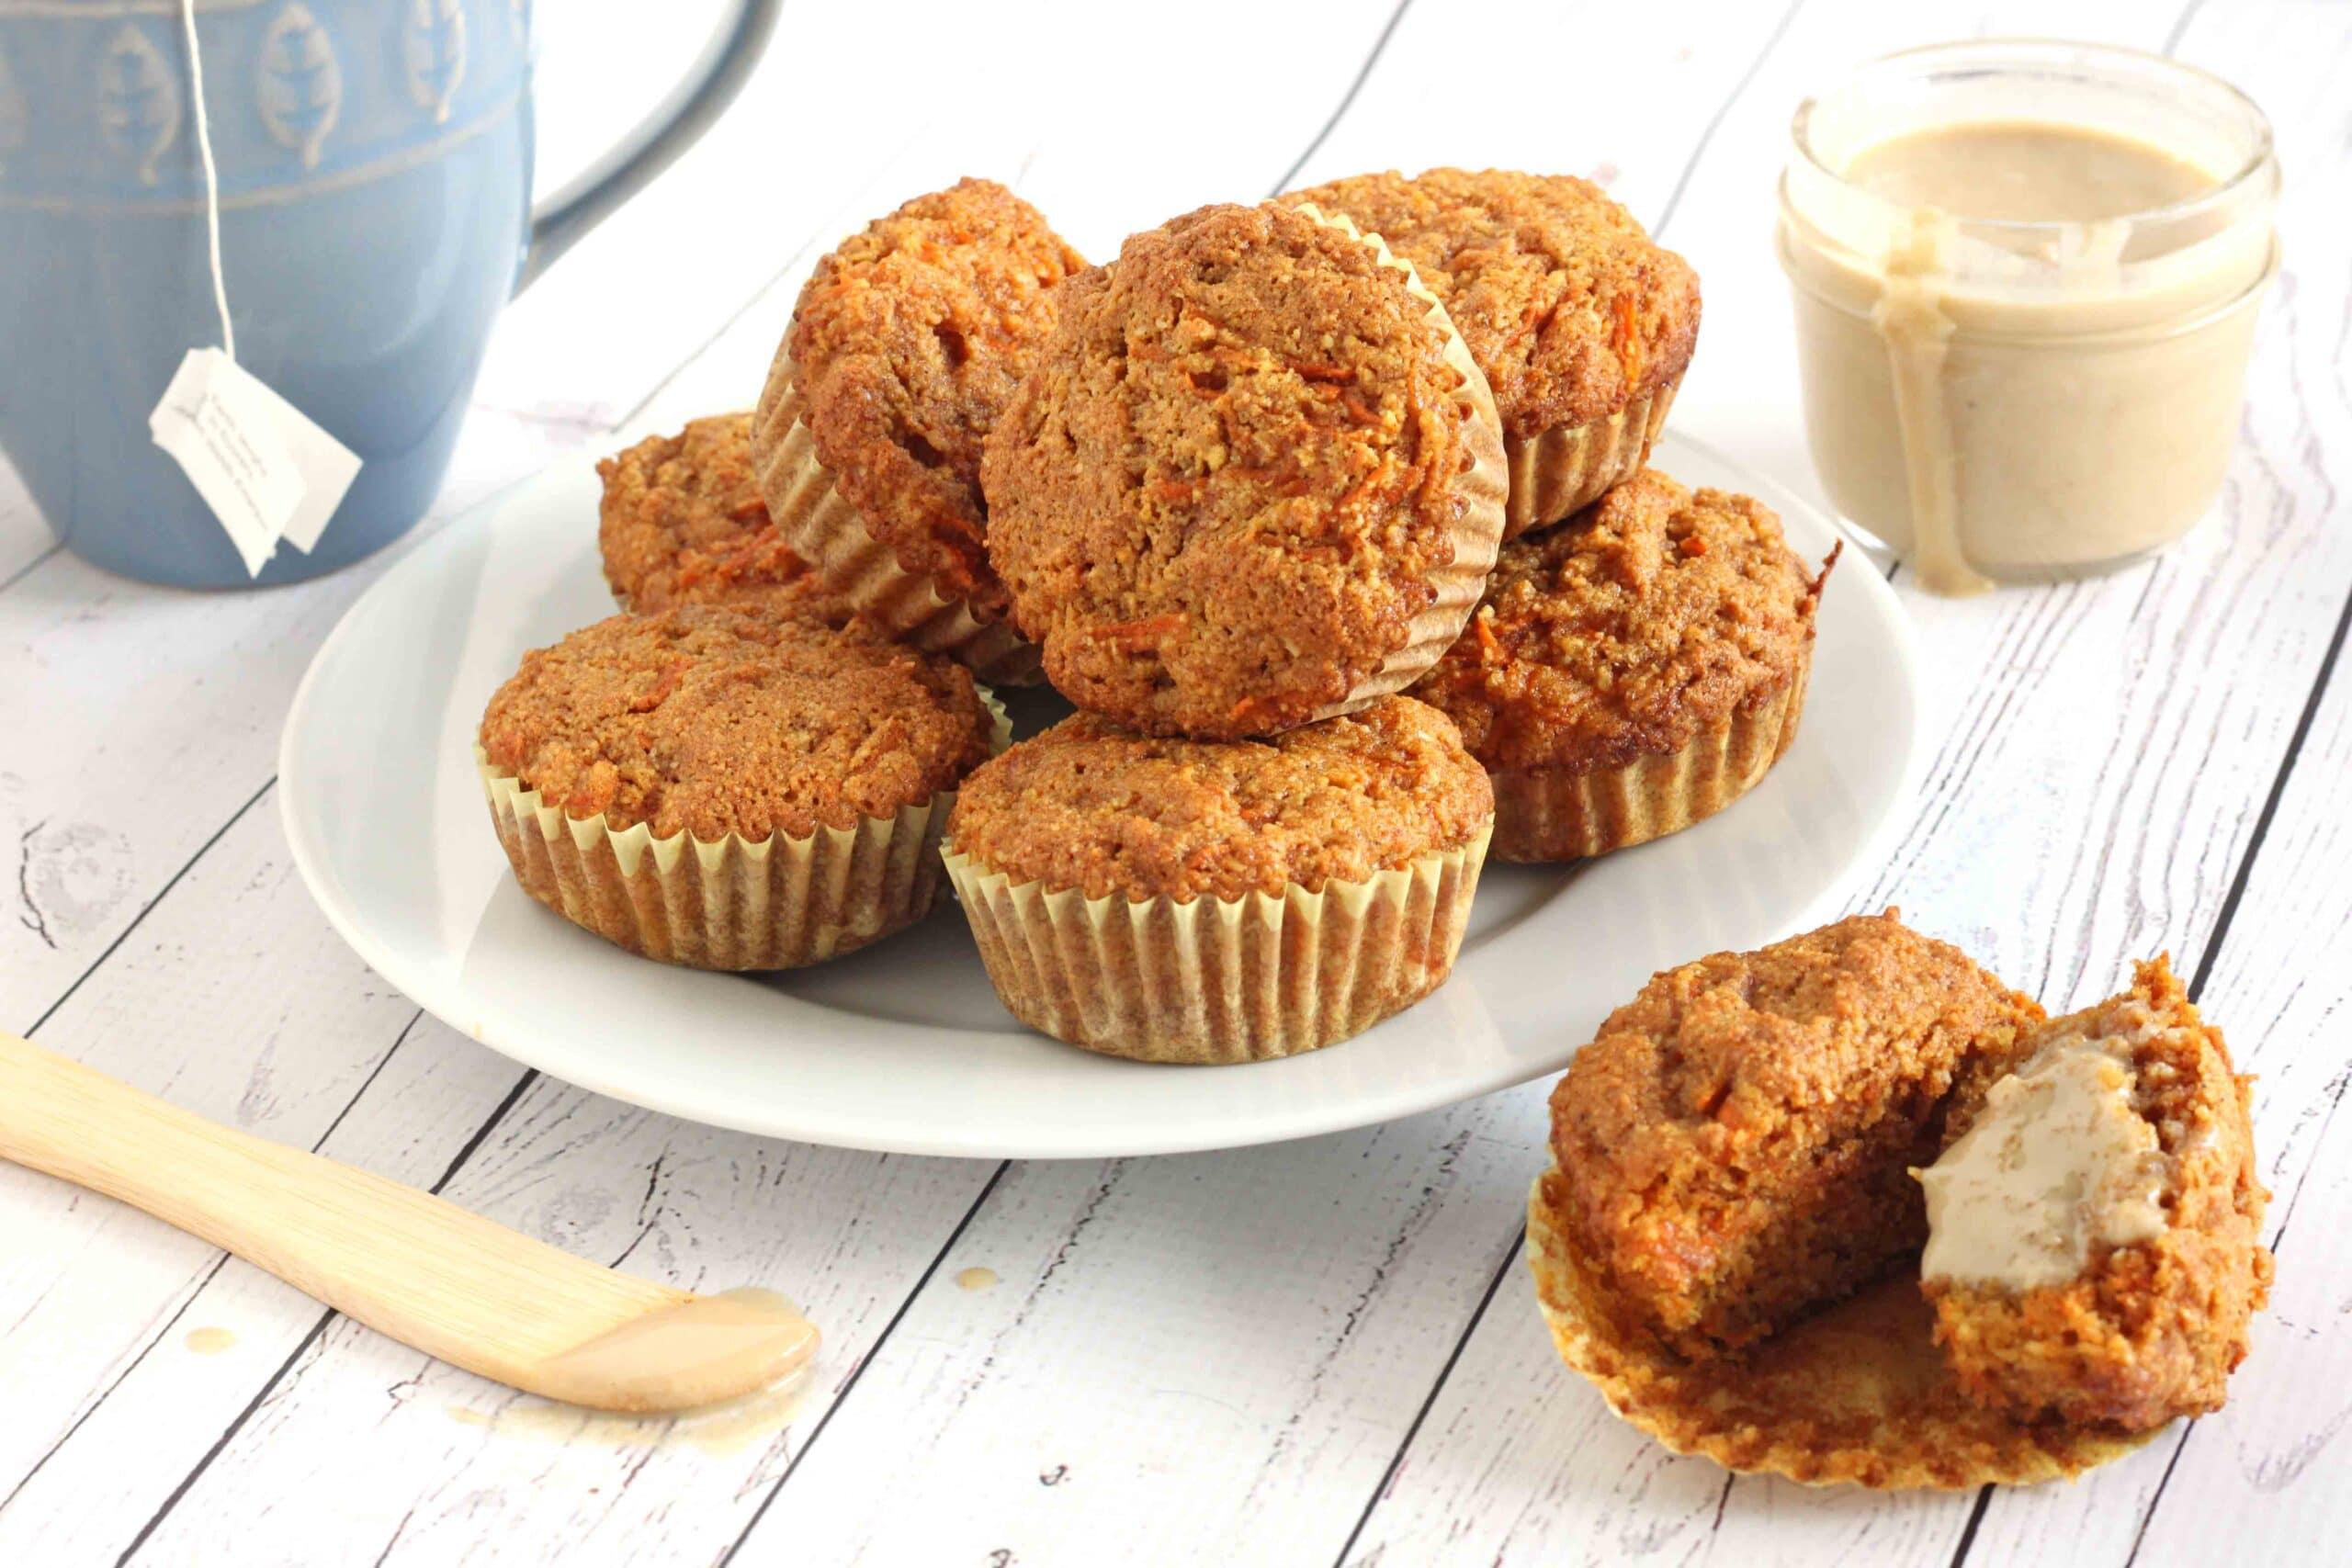 Anti-inflammatory Carrot Muffins by Jeses Lane Welllness